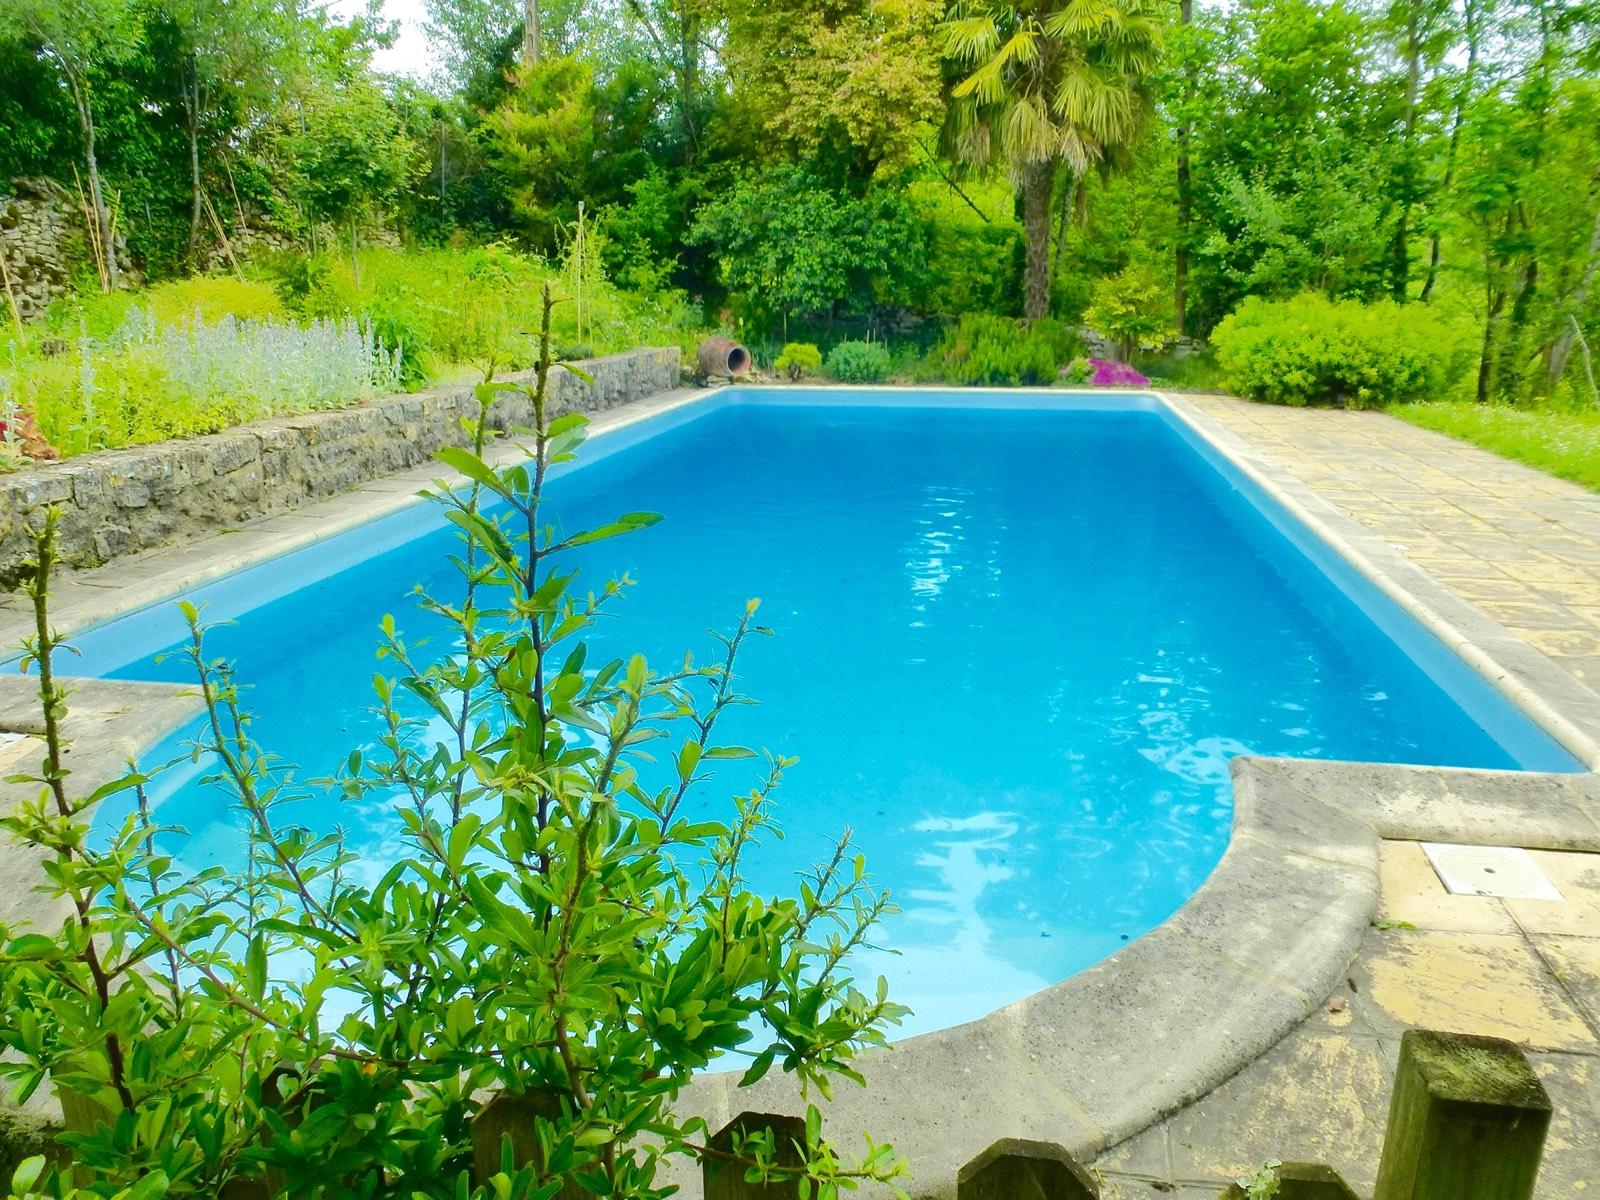 Immobilier figeac art et maisons 1043 maison for Camping figeac avec piscine